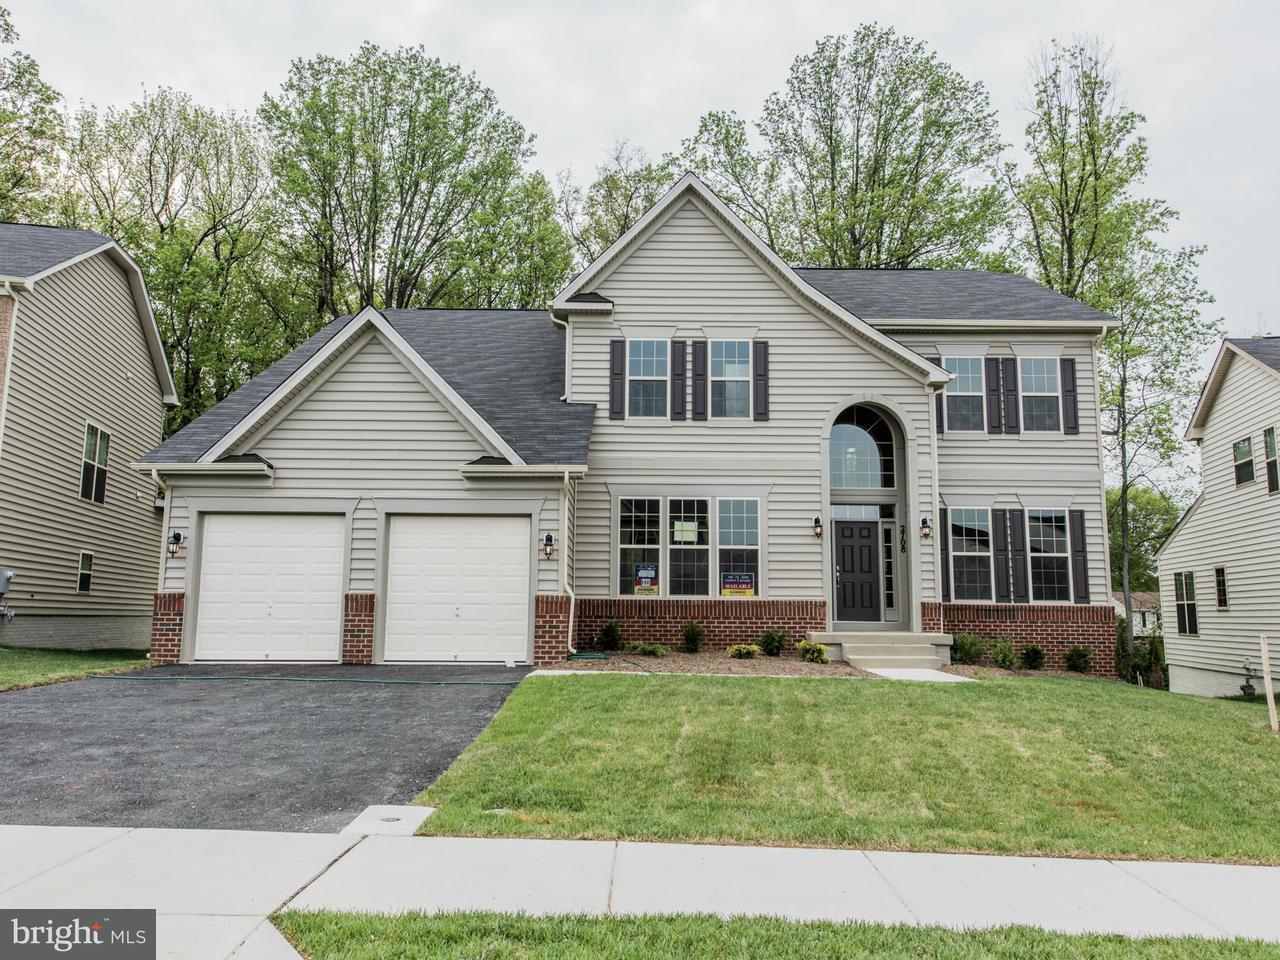 Single Family Home for Sale at 2408 ST. NICHOLAS WAY 2408 ST. NICHOLAS WAY Glenarden, Maryland 20706 United States